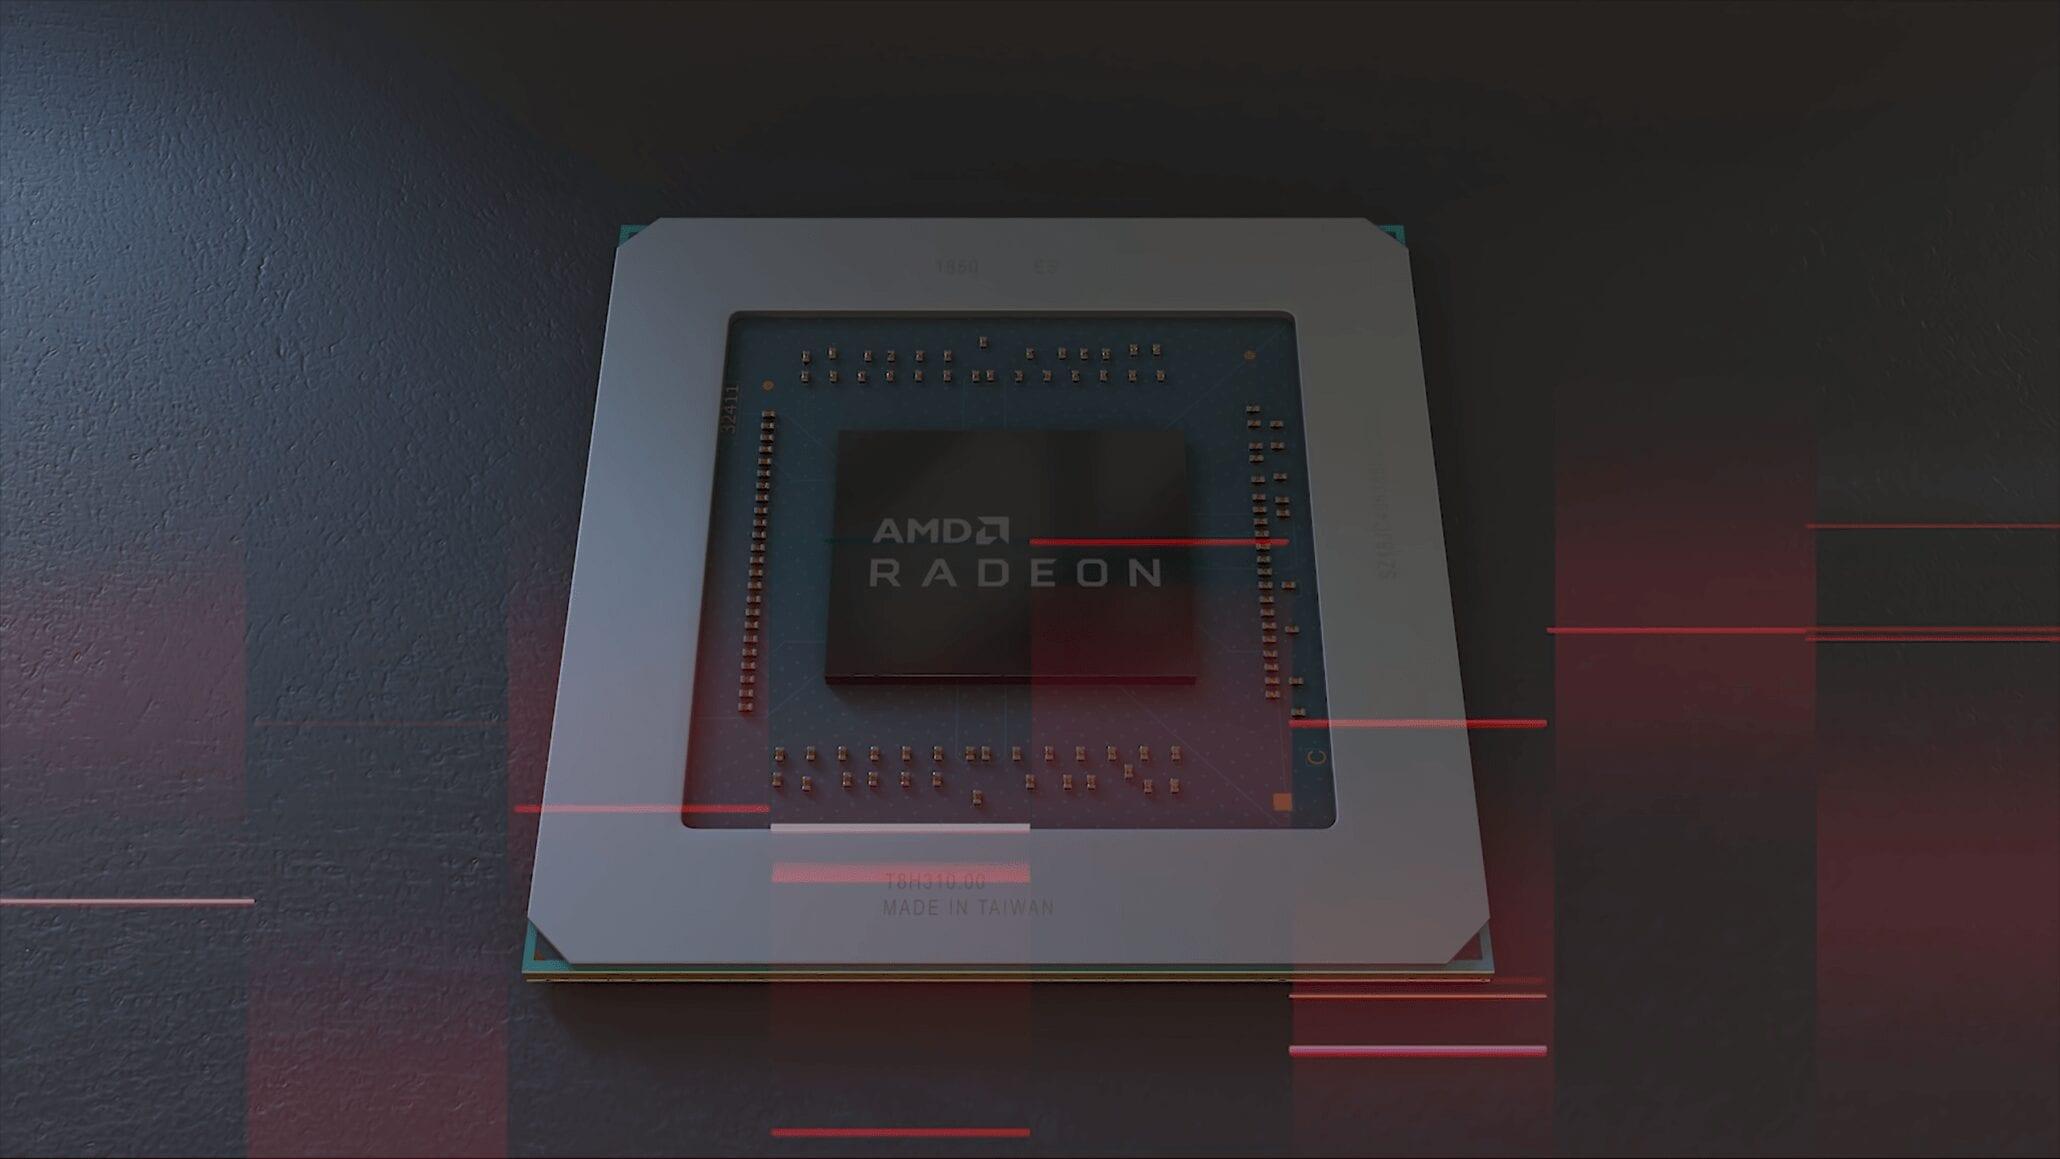 Слухи: Видеокарты на основе GPU AMD Navi 21 «Big Navi» будут нести на своем борту 12 ГБ и 16 ГБ видеопамяти GDDR6